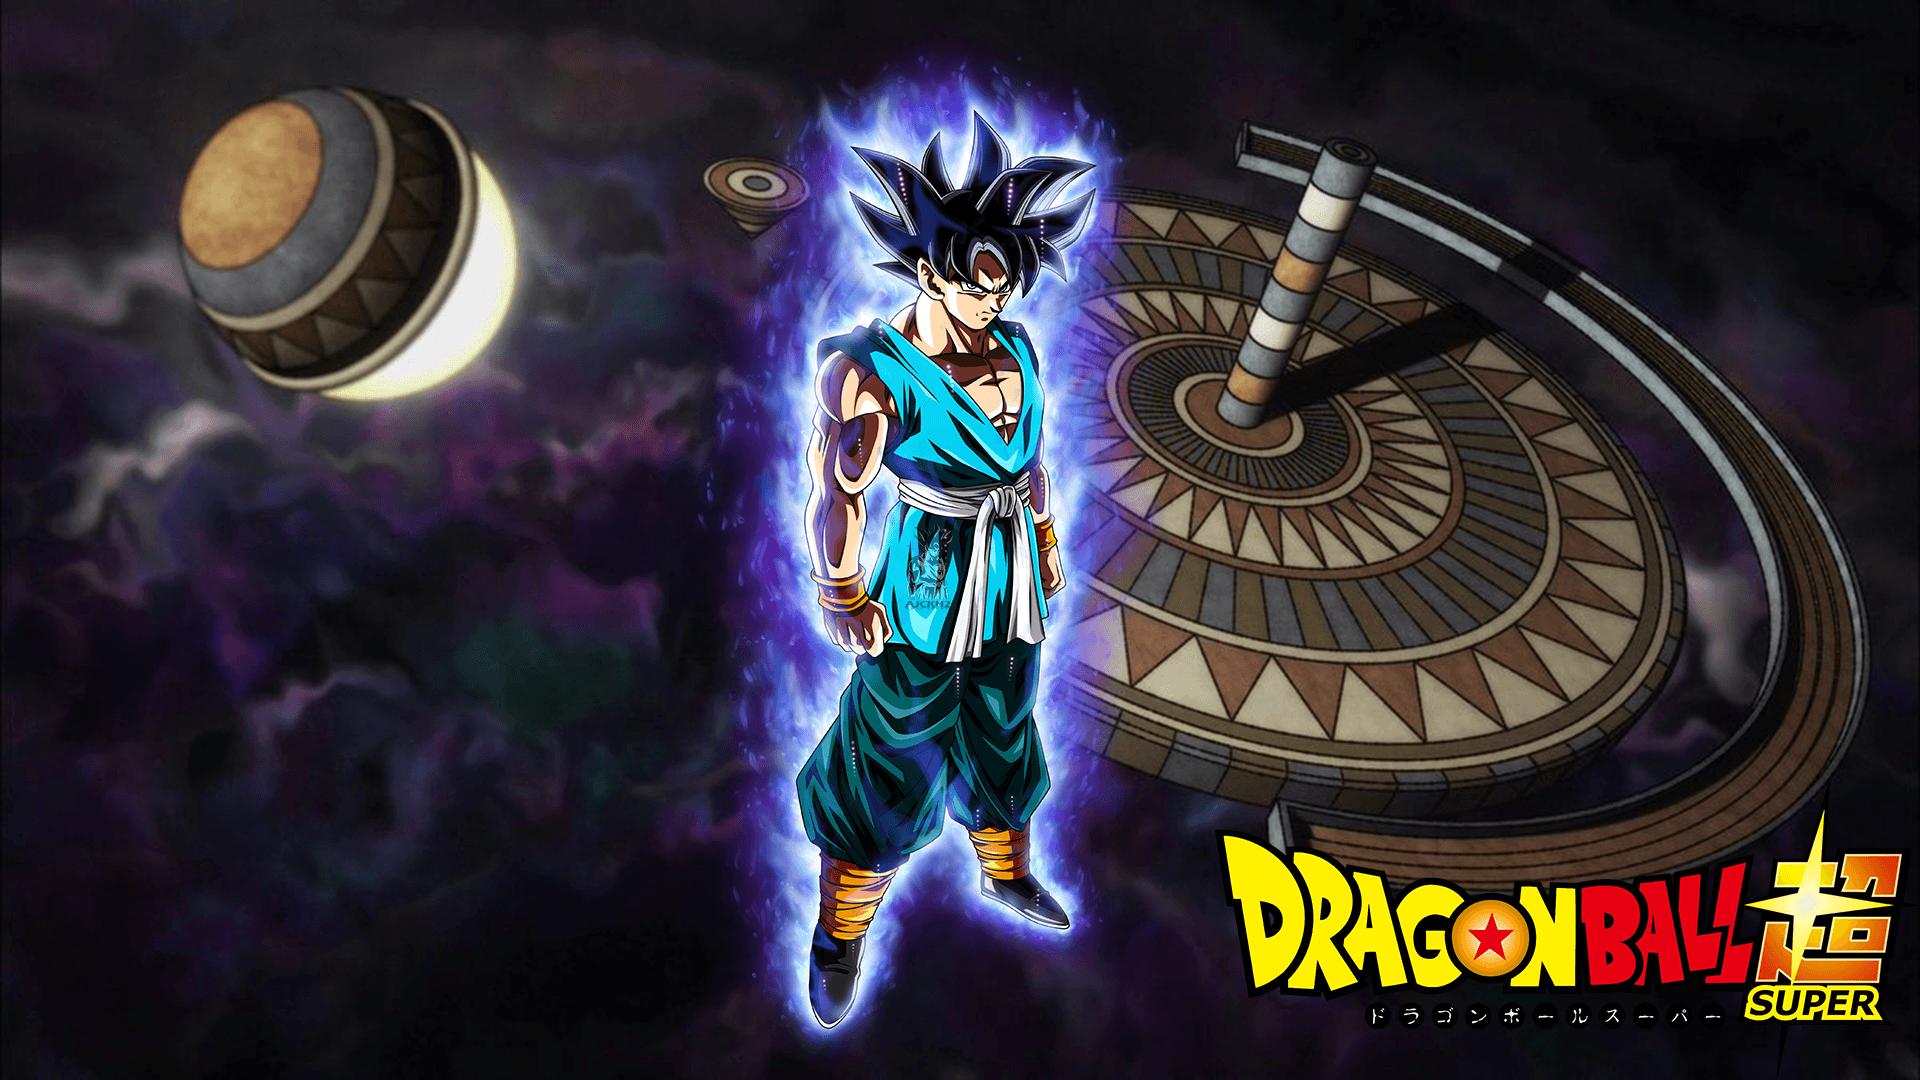 Ultra Instinct Goku Wallpapers Top Free Ultra Instinct Goku Backgrounds Wallpaperaccess Goku Ultra Instinct Goku Goku Wallpaper